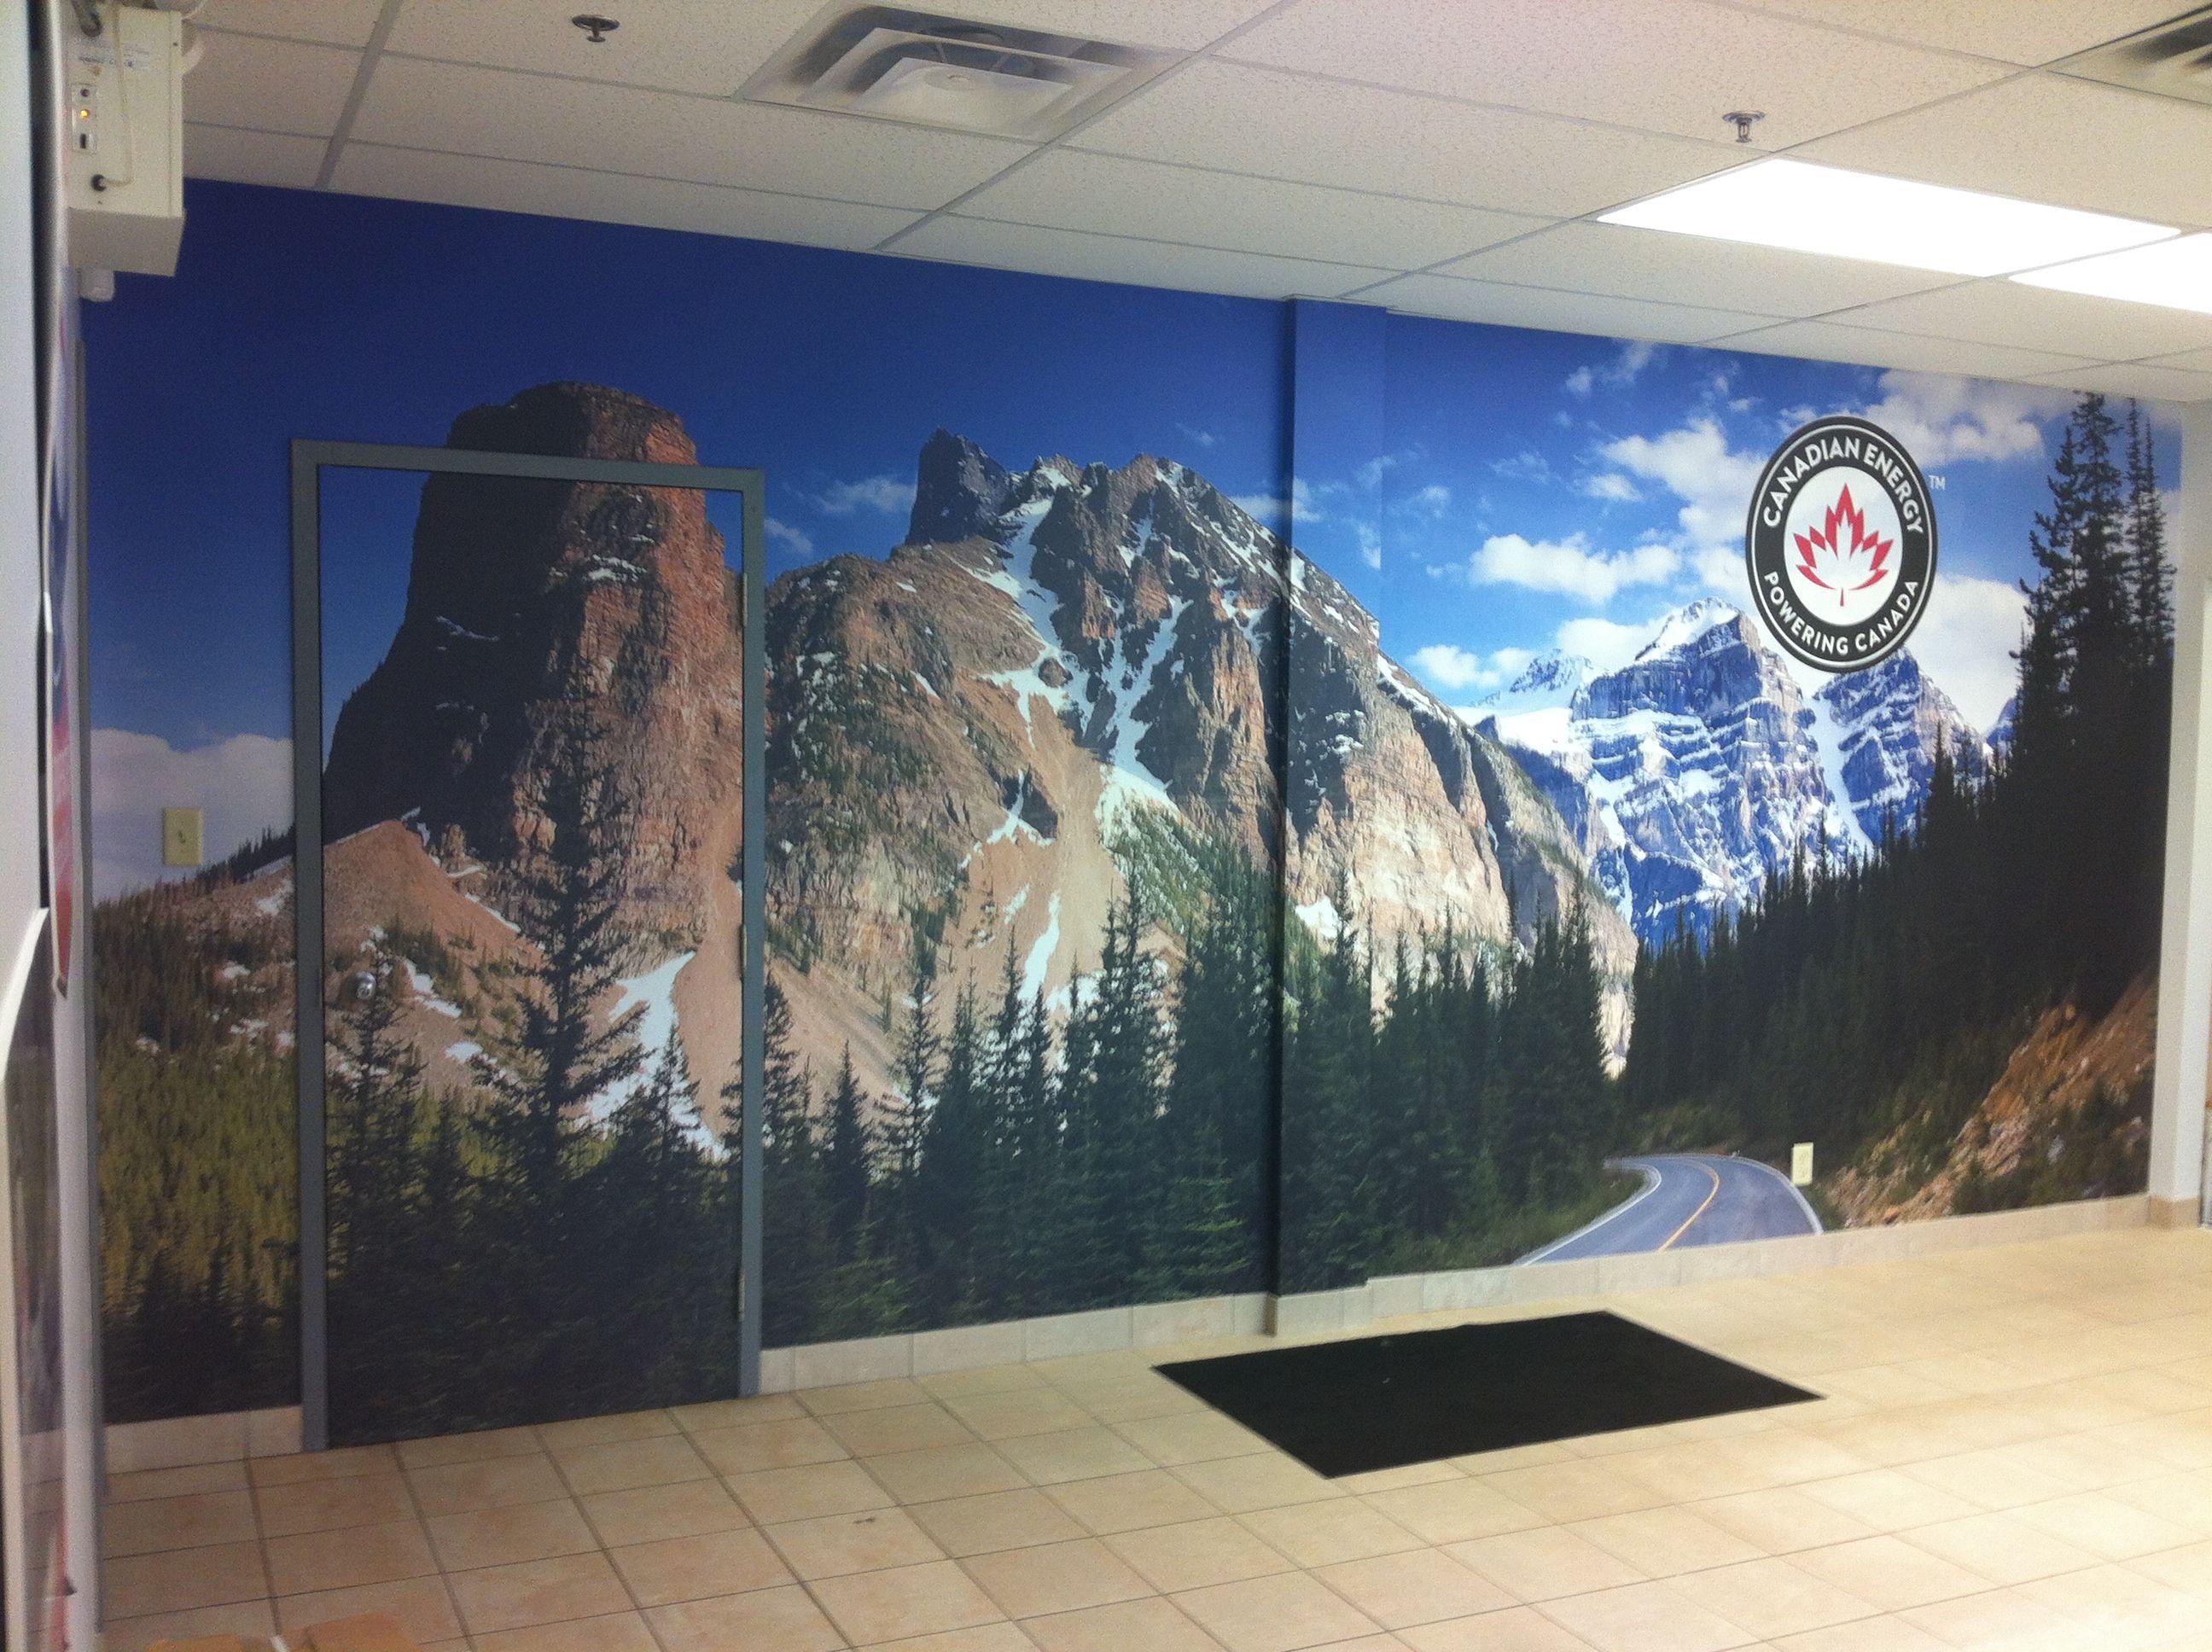 Custom wall mural ideas for your office space #officemurals  #customwallart